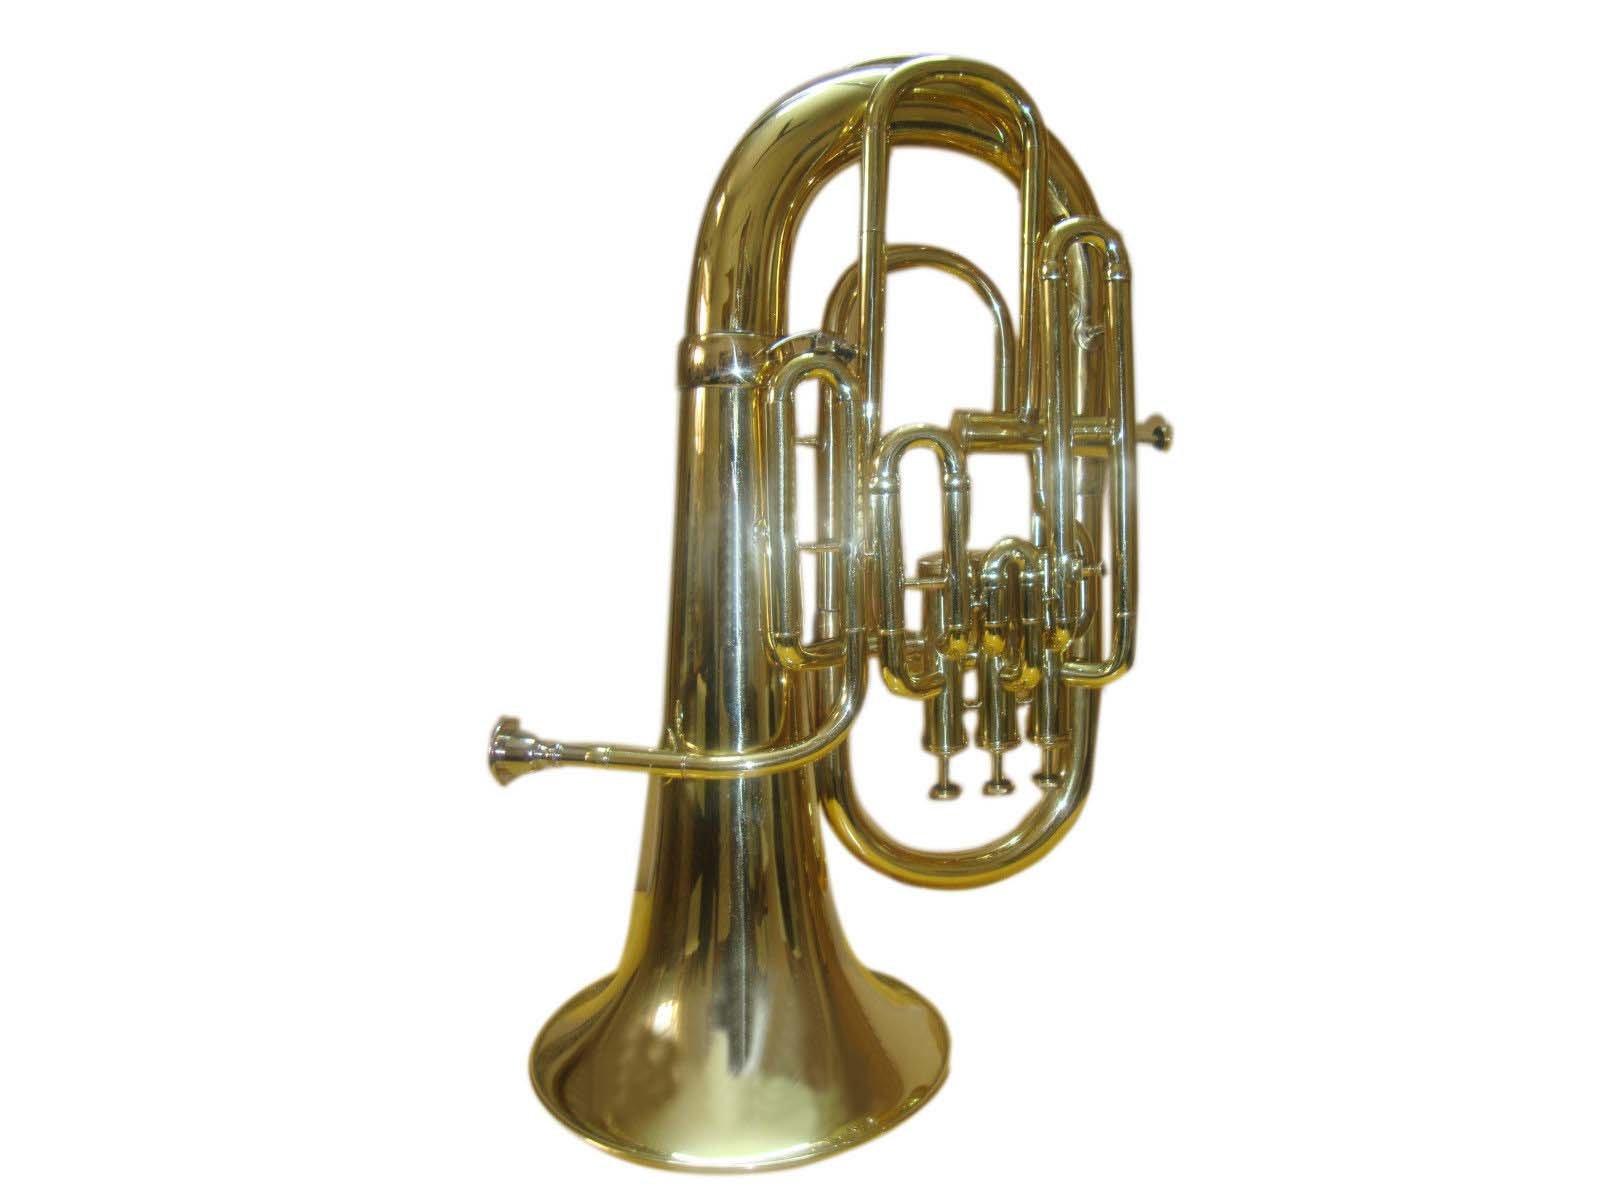 SHREYAS Bb/F 4 Valve Flat Brass Finishing Euphonium With Free Hard Case+M/P